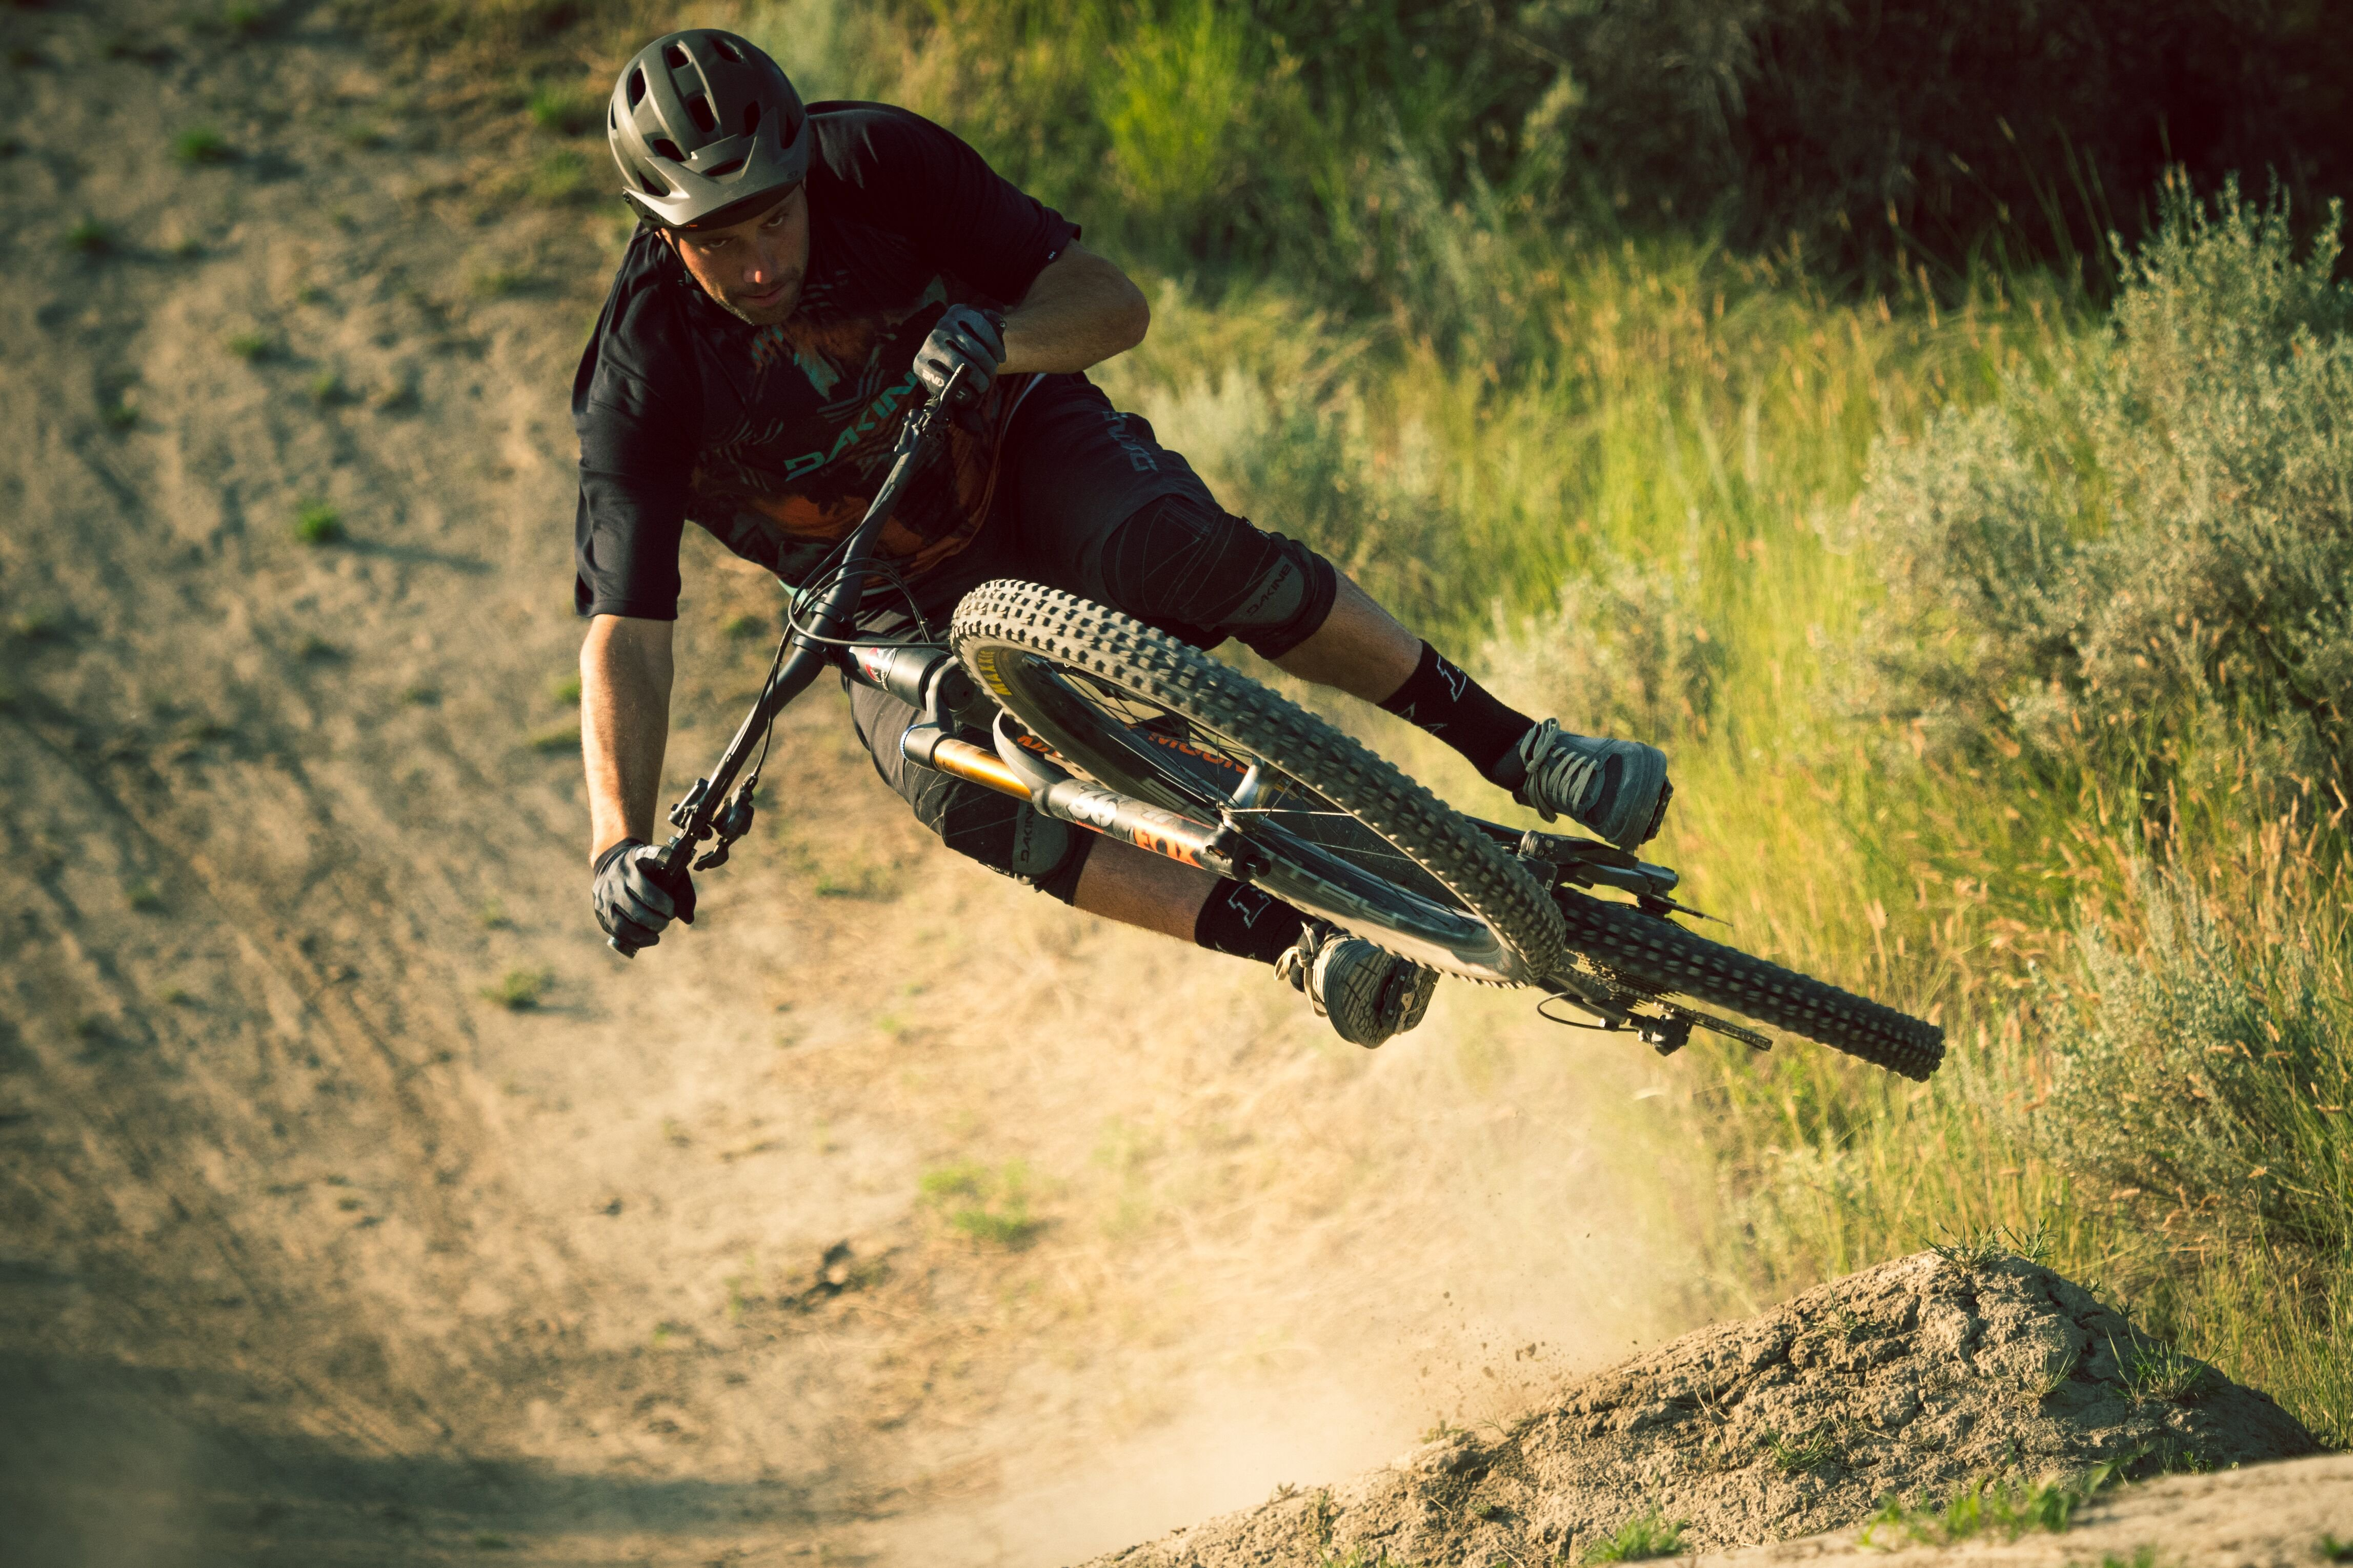 NSMB.com - Video: Vanderham Trail Bike Boss'n